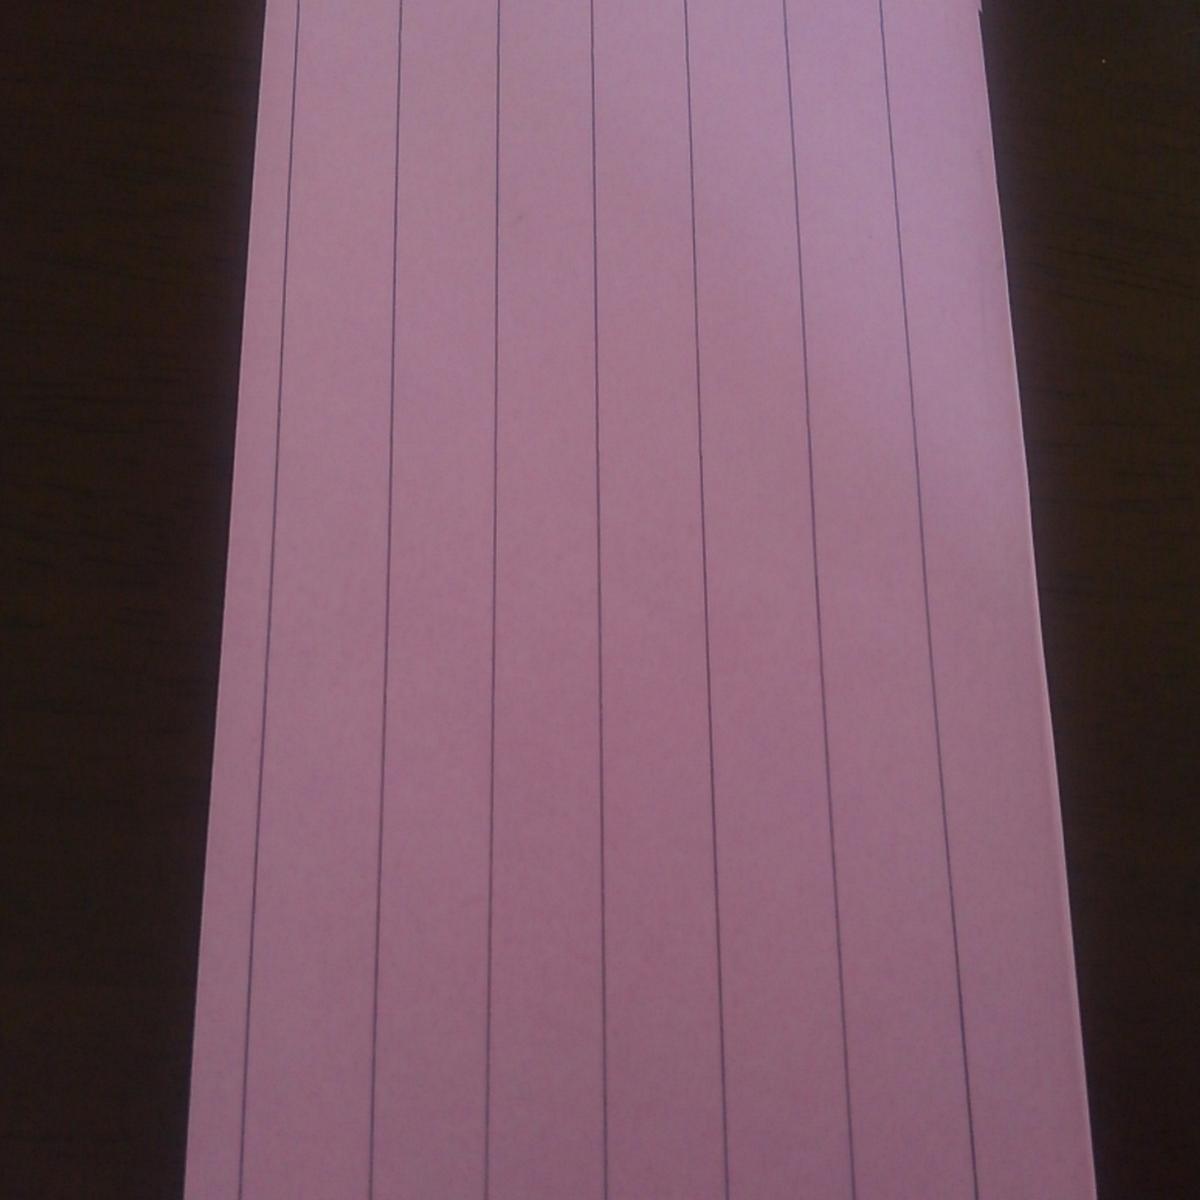 鬼滅の刃 折り紙 羽織 簡単 禰豆子